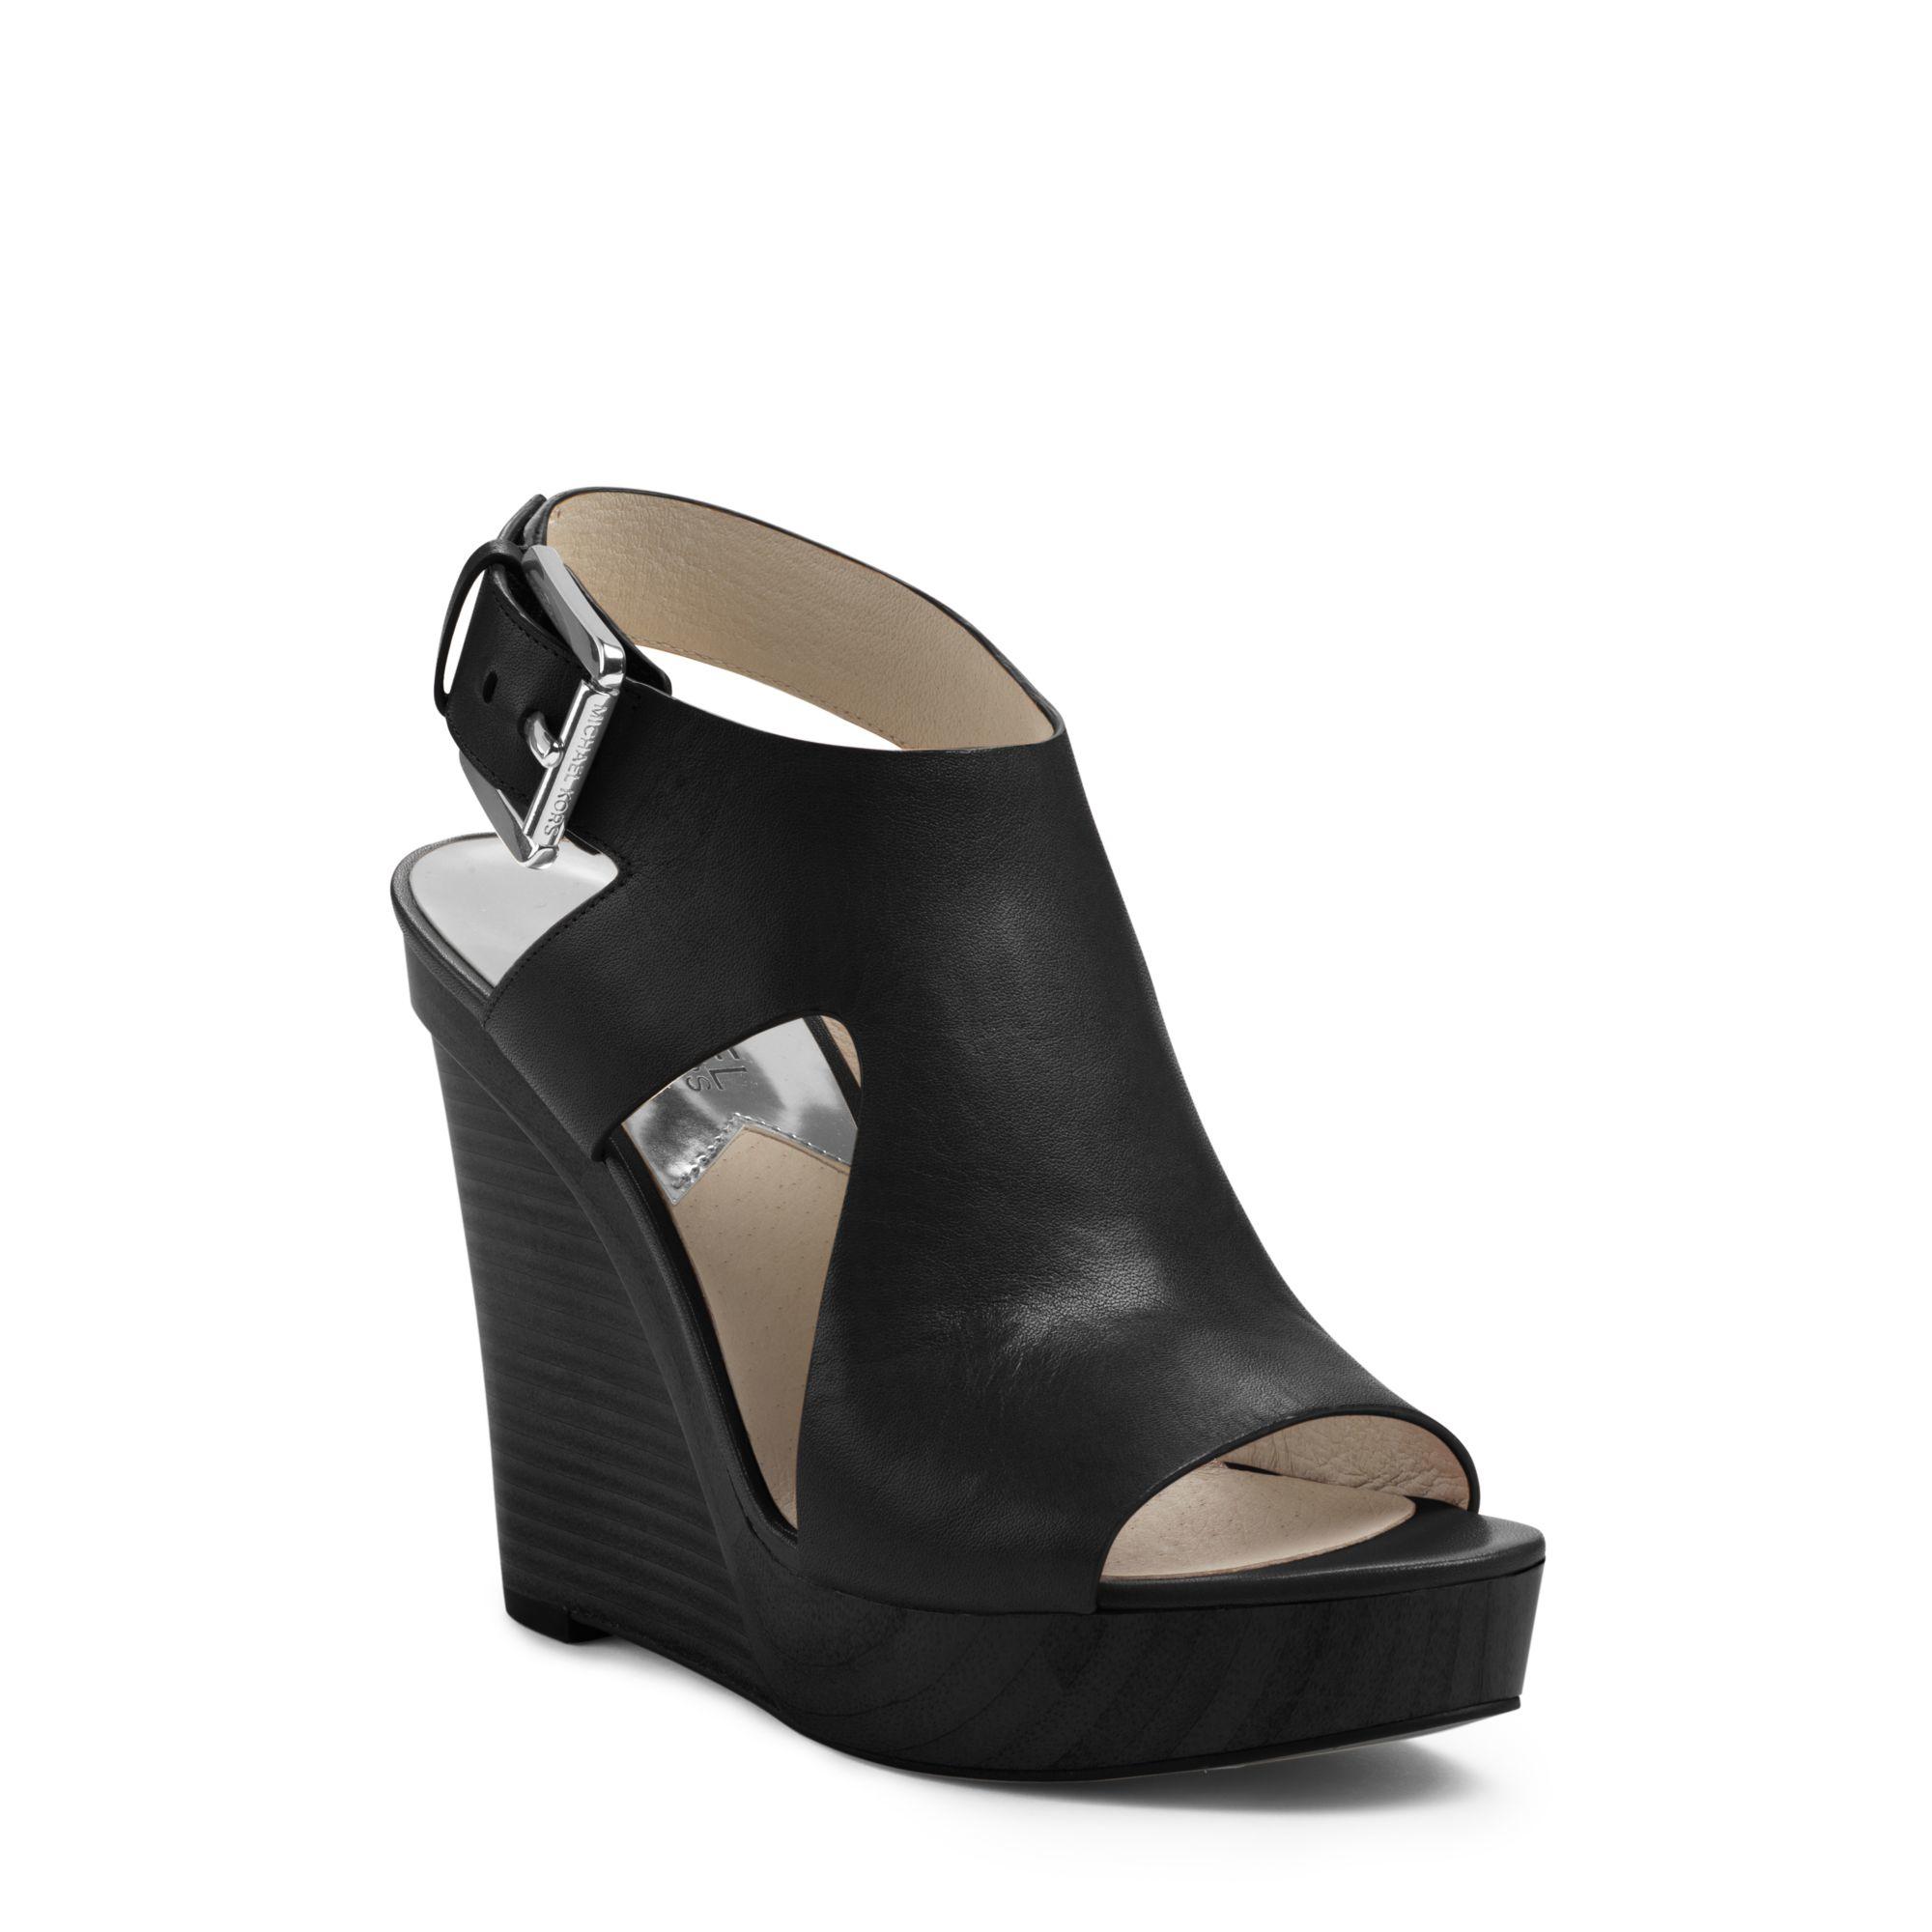 michael kors josephine leather wedge in black lyst